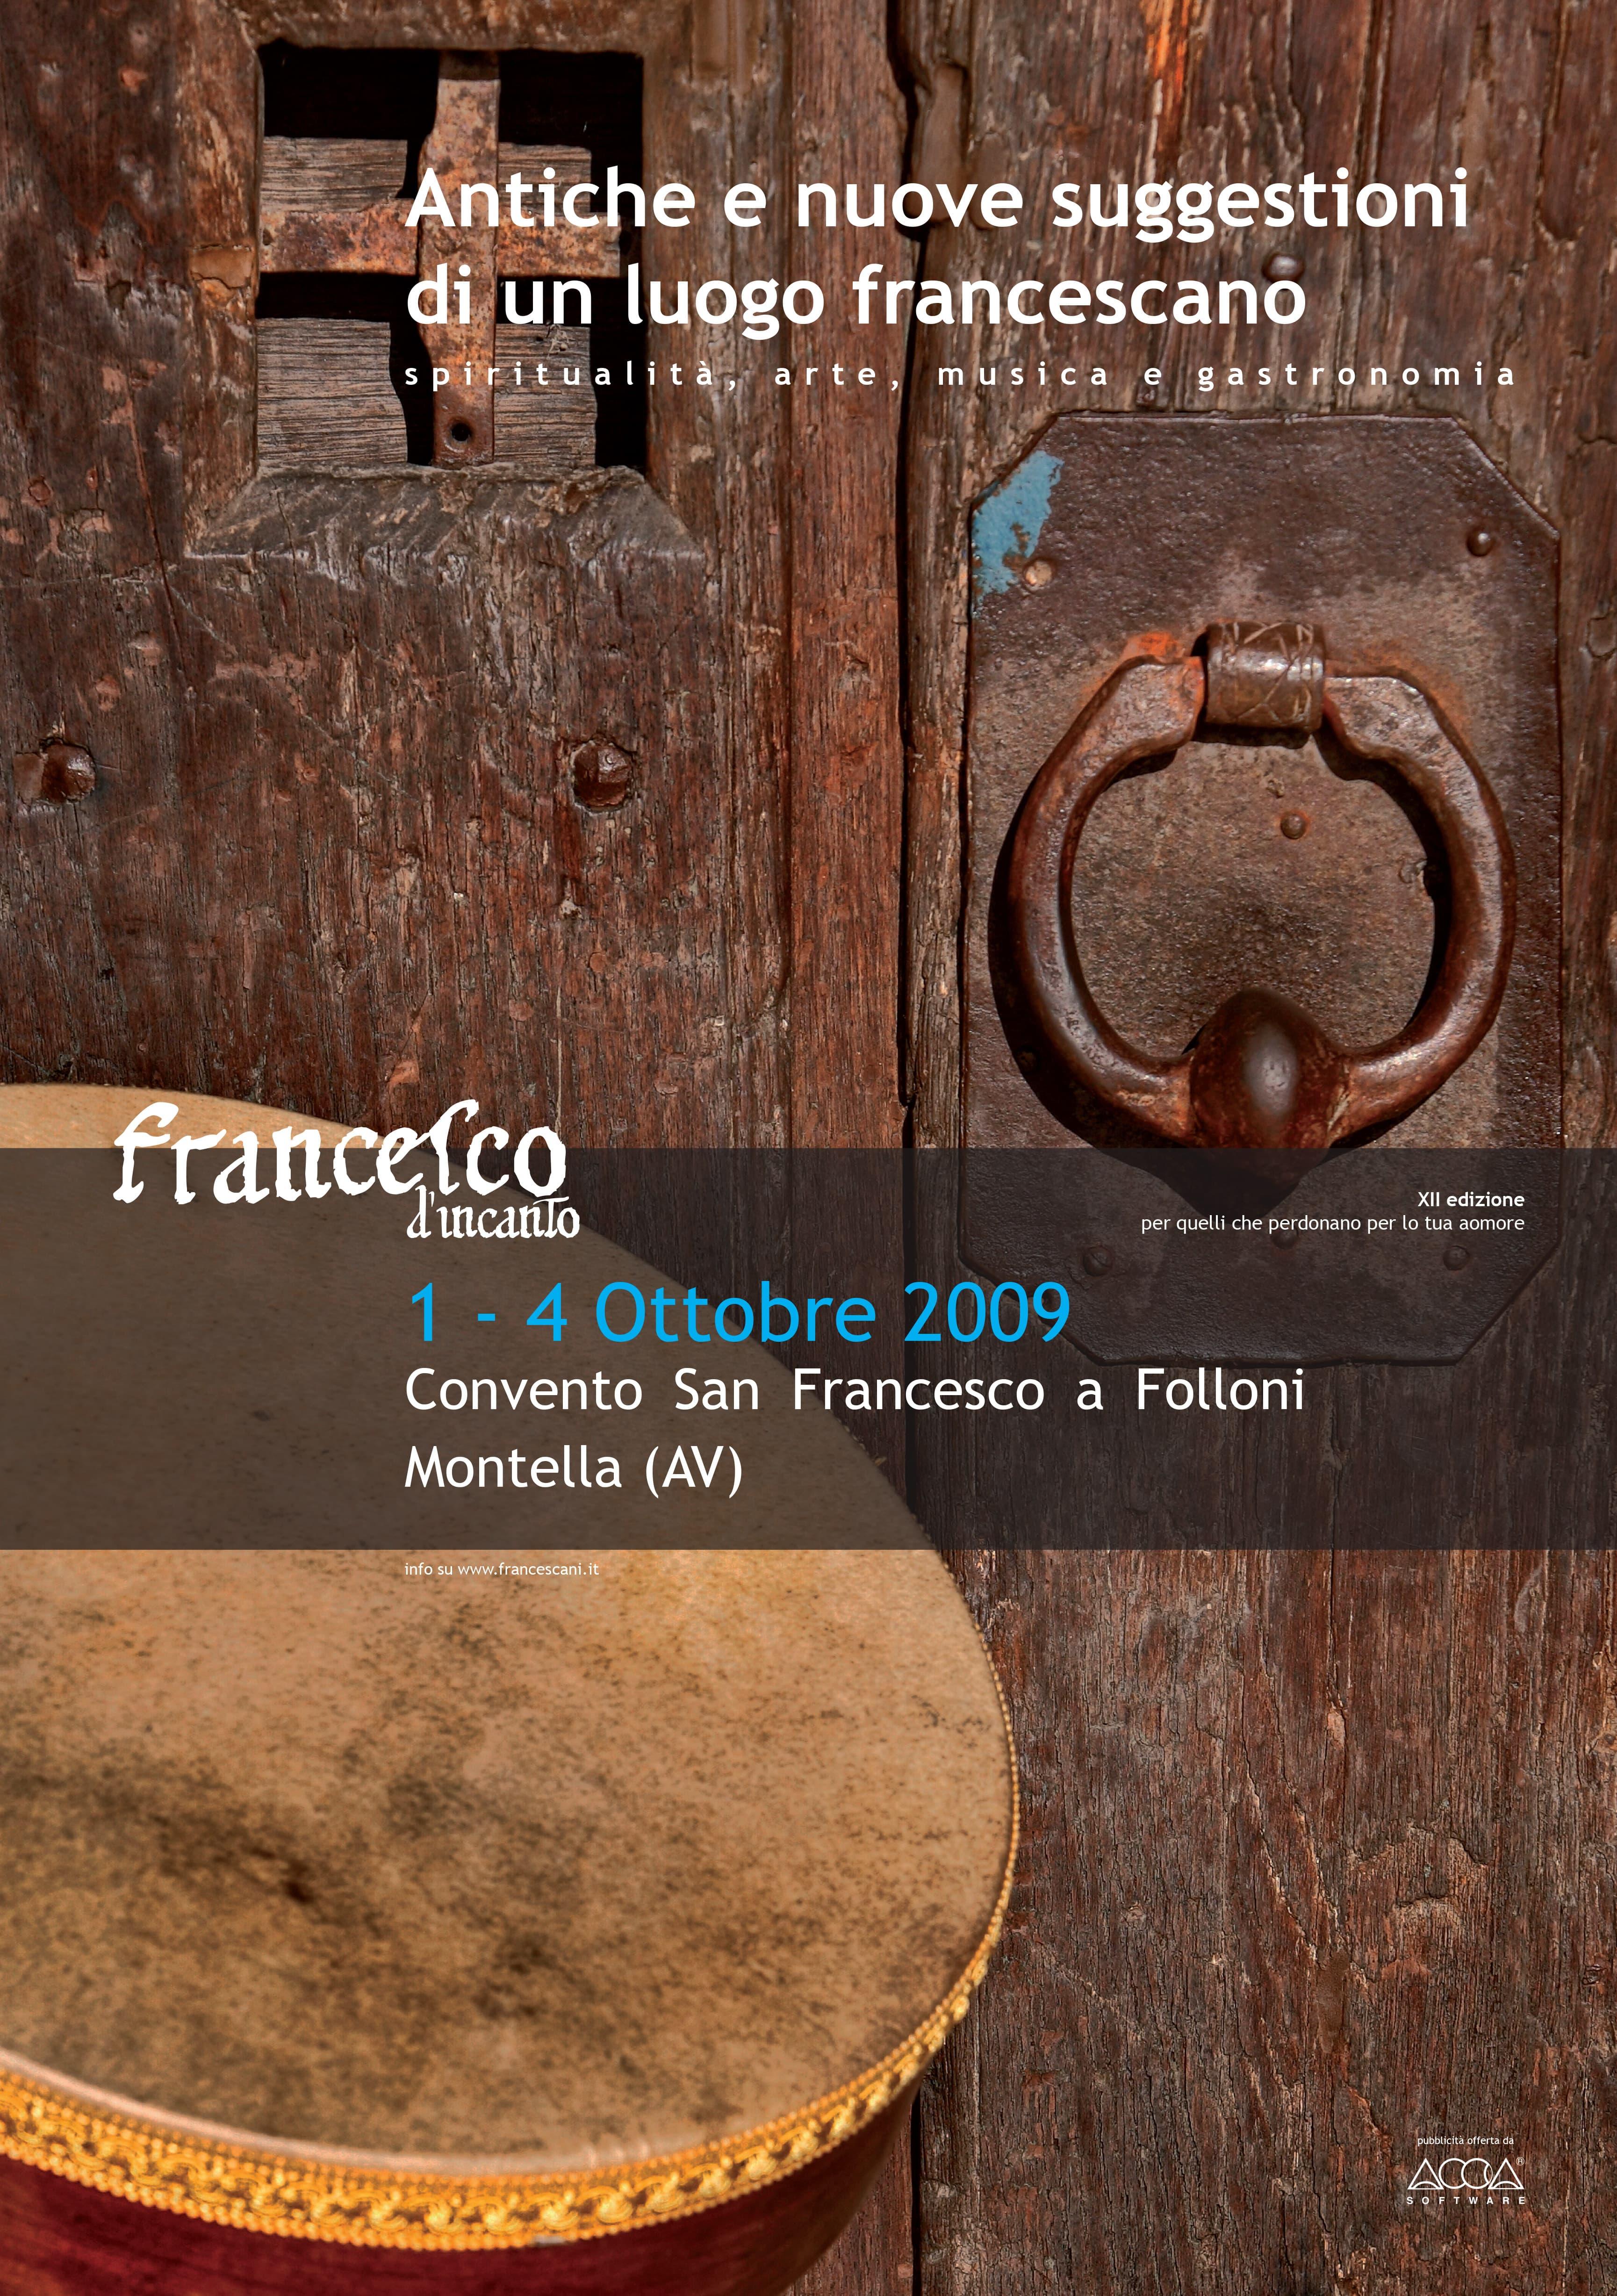 Francesco D'Incanto Locandina 2009B